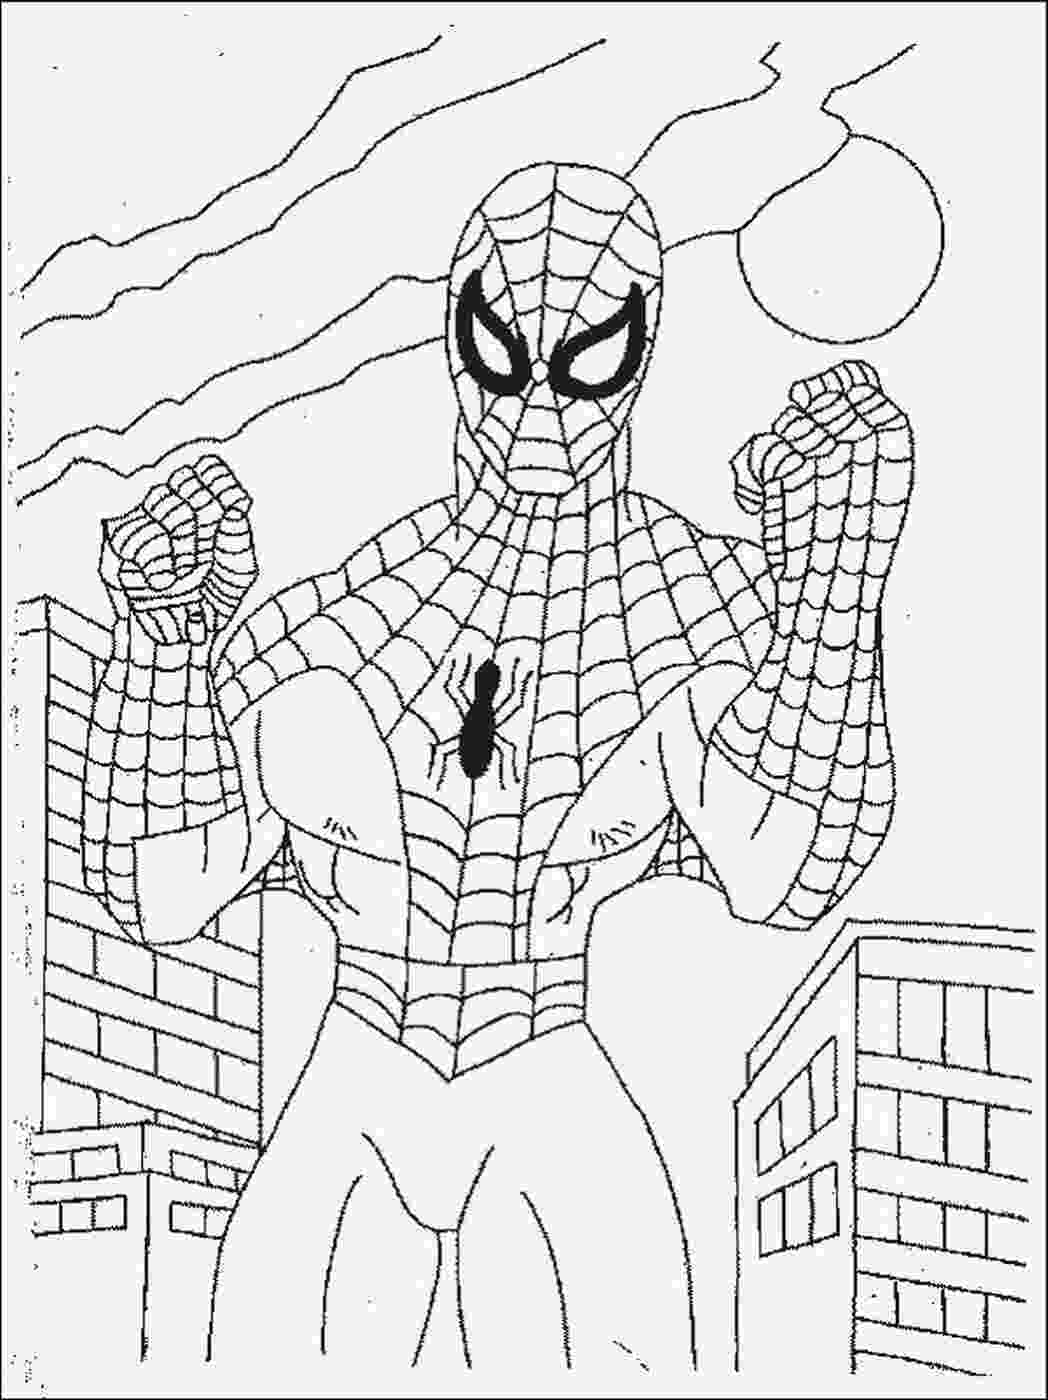 spider man coloring sheet free printable spiderman coloring pages for kids man spider sheet coloring